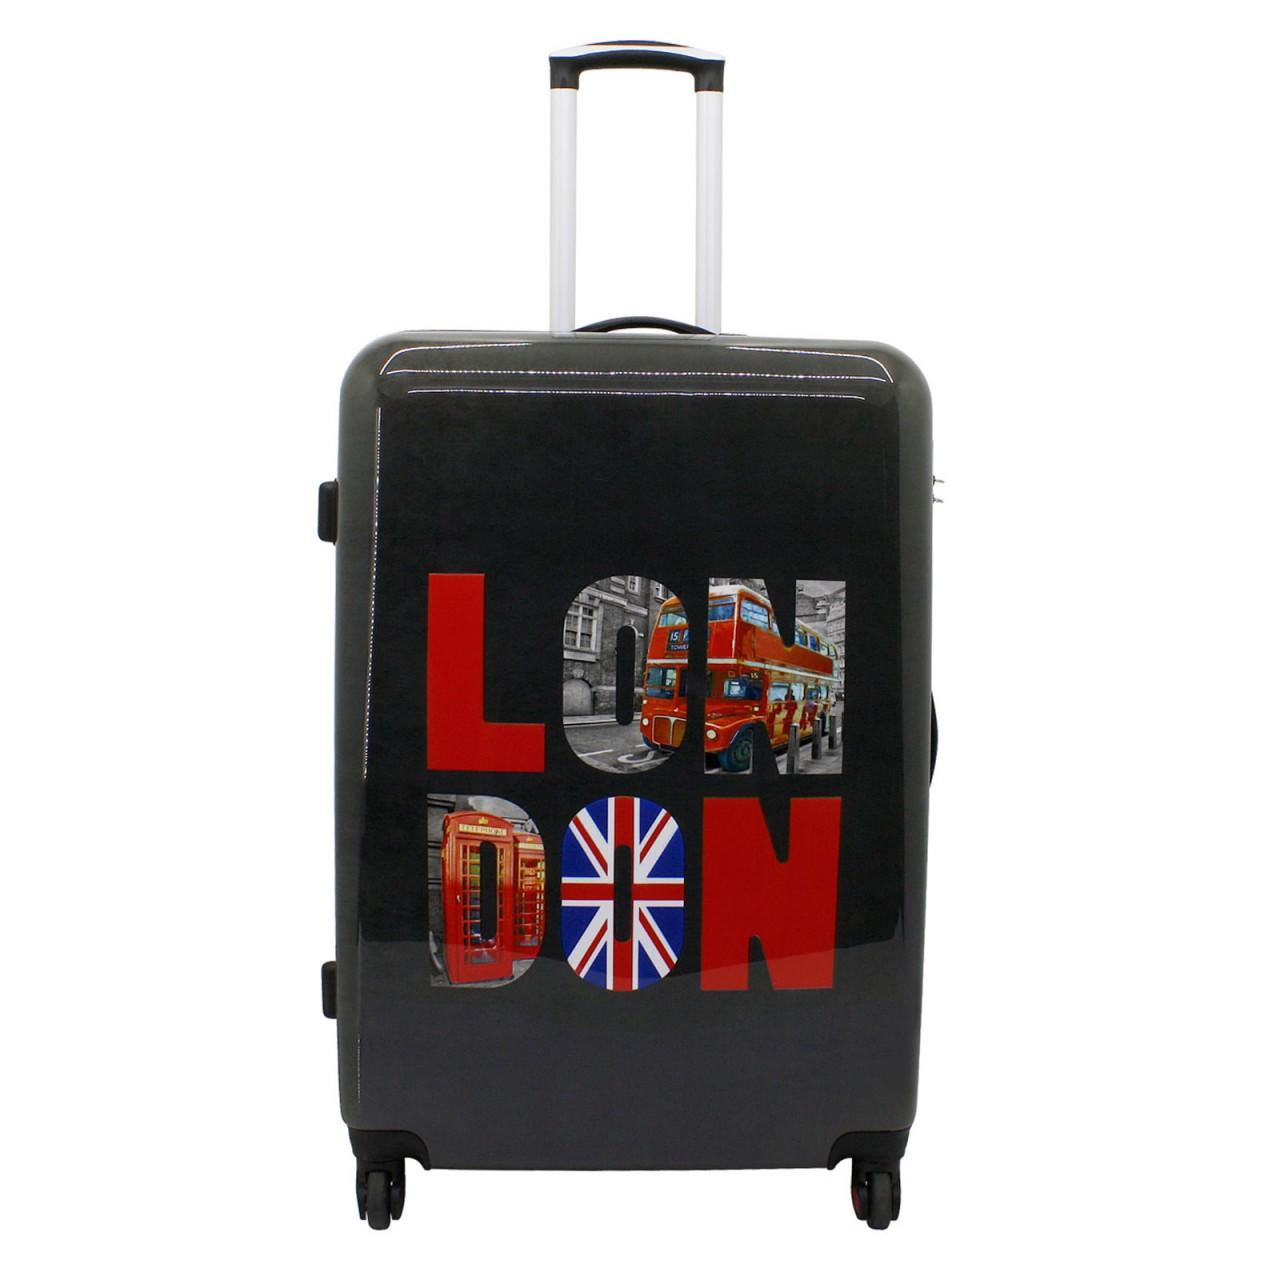 f23 voyage london trolley gro g nstig kaufen koffermarkt. Black Bedroom Furniture Sets. Home Design Ideas